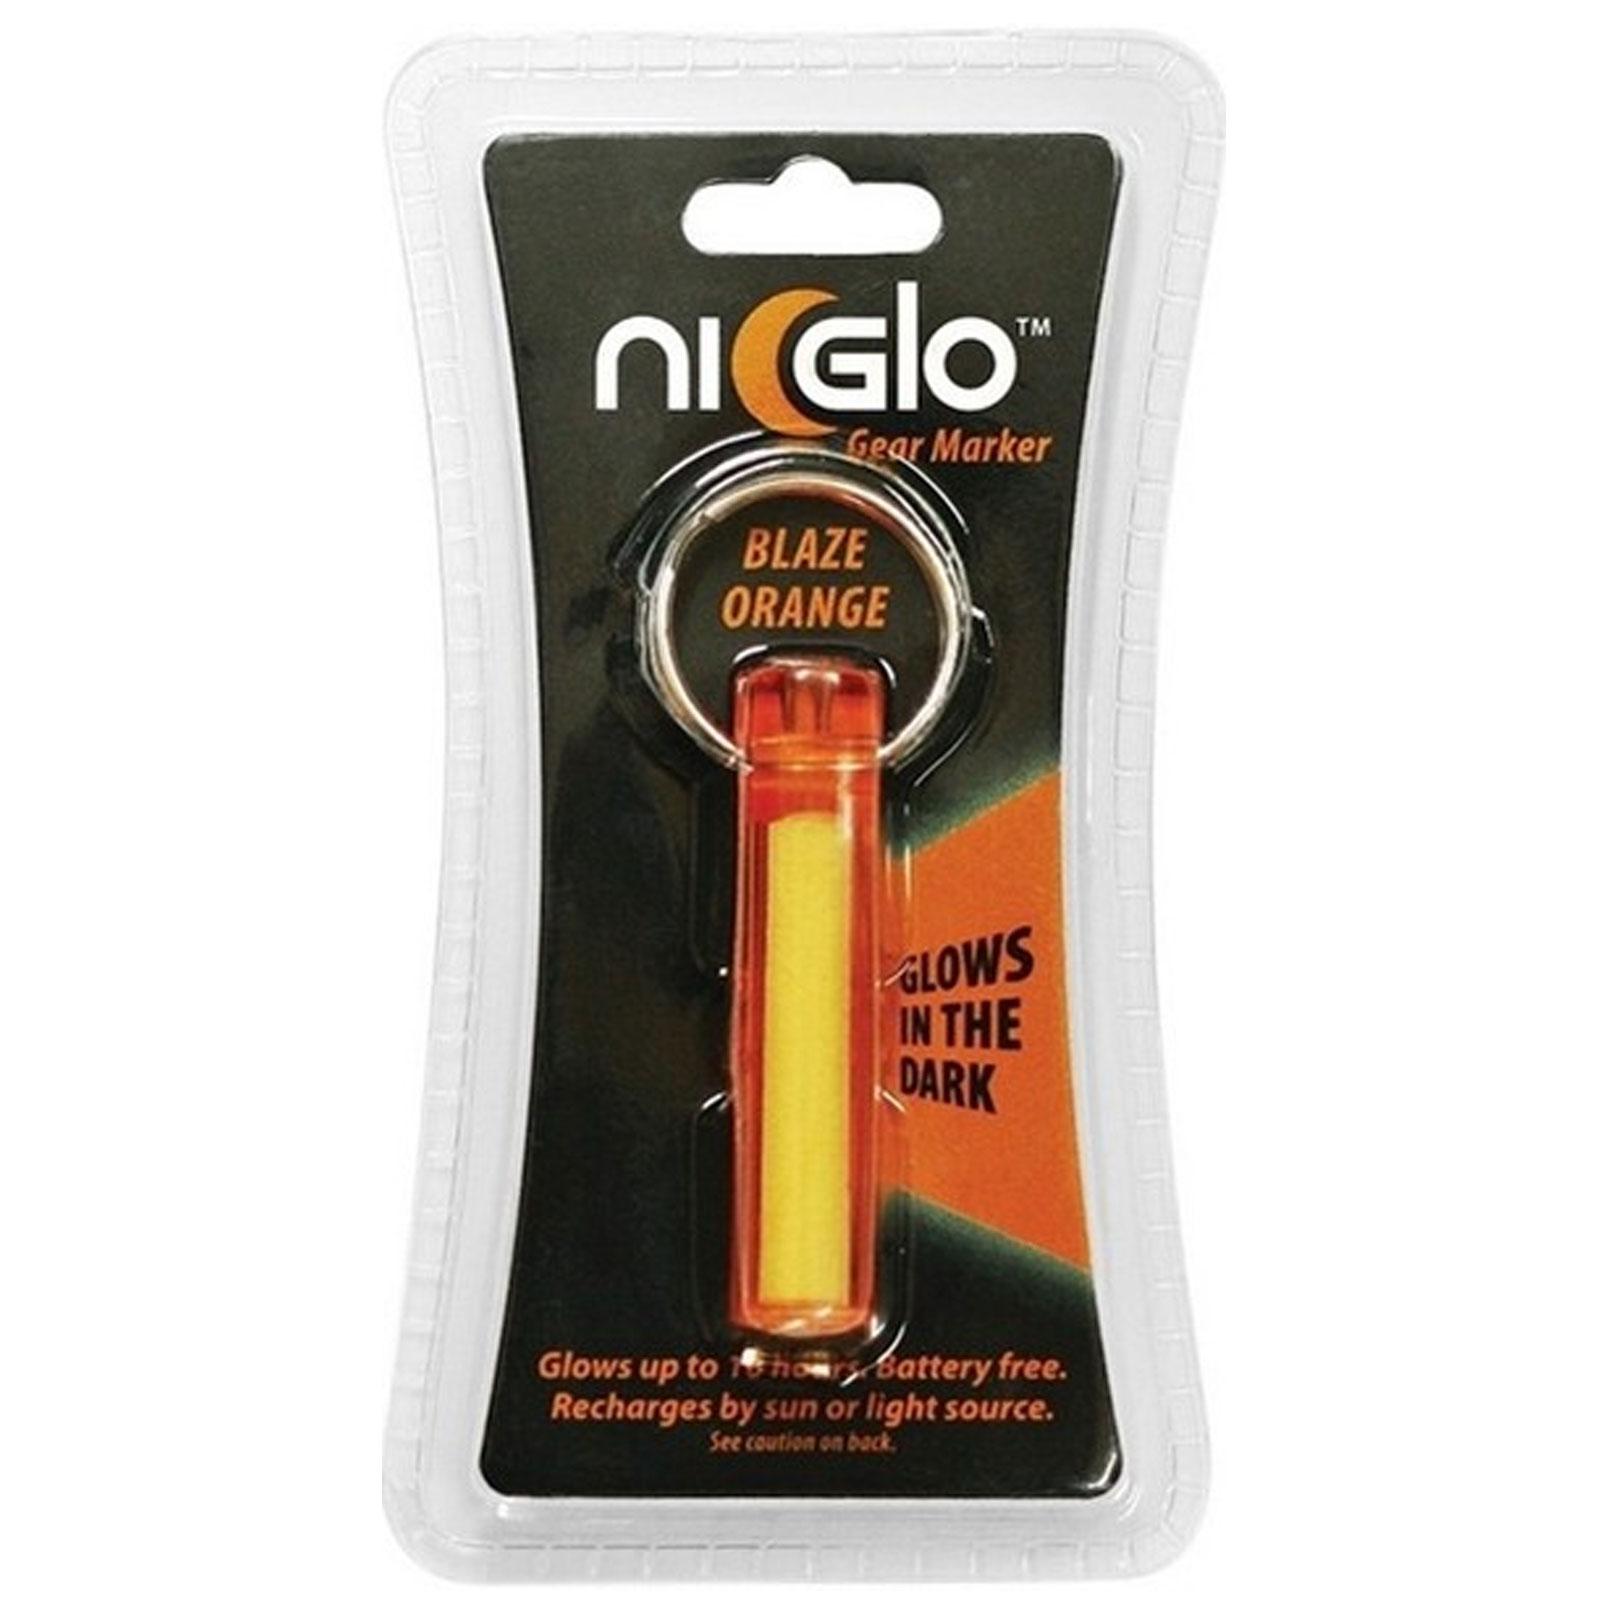 Ni Glo Auto Auto Auto Glowing Gear Kit Marqueur-Glow in the Dark-DofE survie b56b71